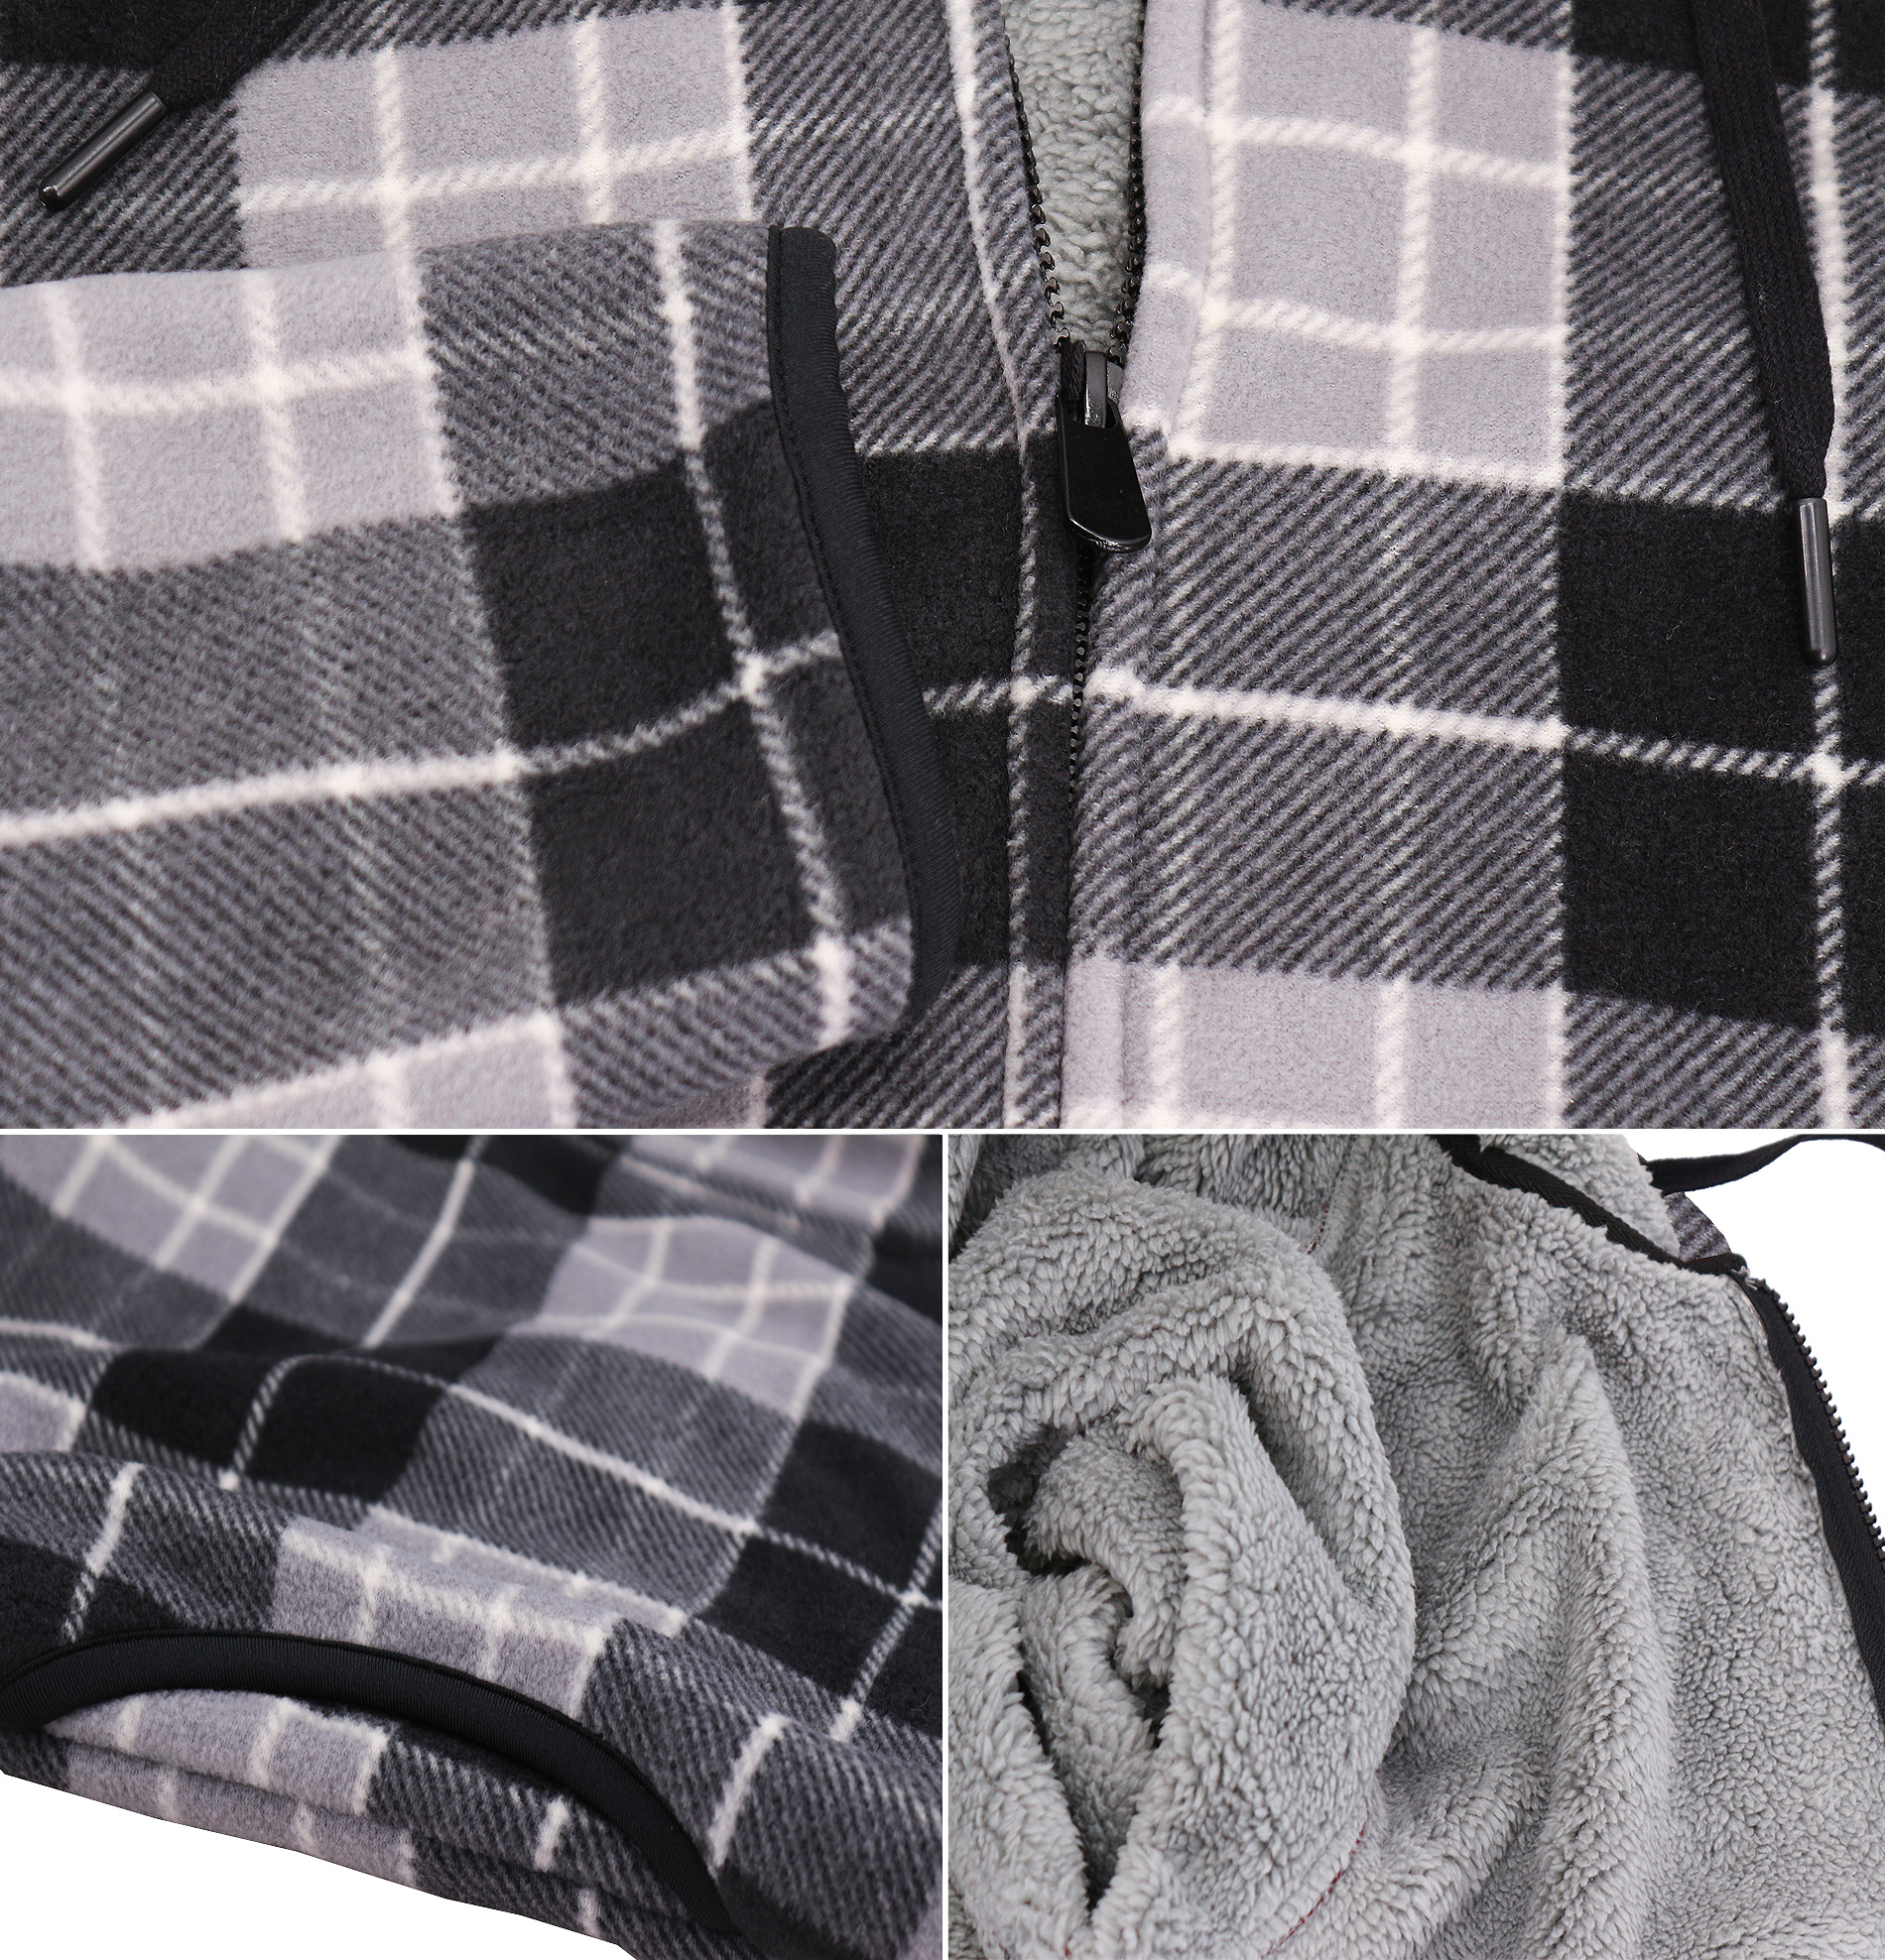 Men-039-s-Casual-Flannel-Zip-Up-Fleece-Lined-Plaid-Sherpa-Hoodie-Lightweight-Jacket thumbnail 16